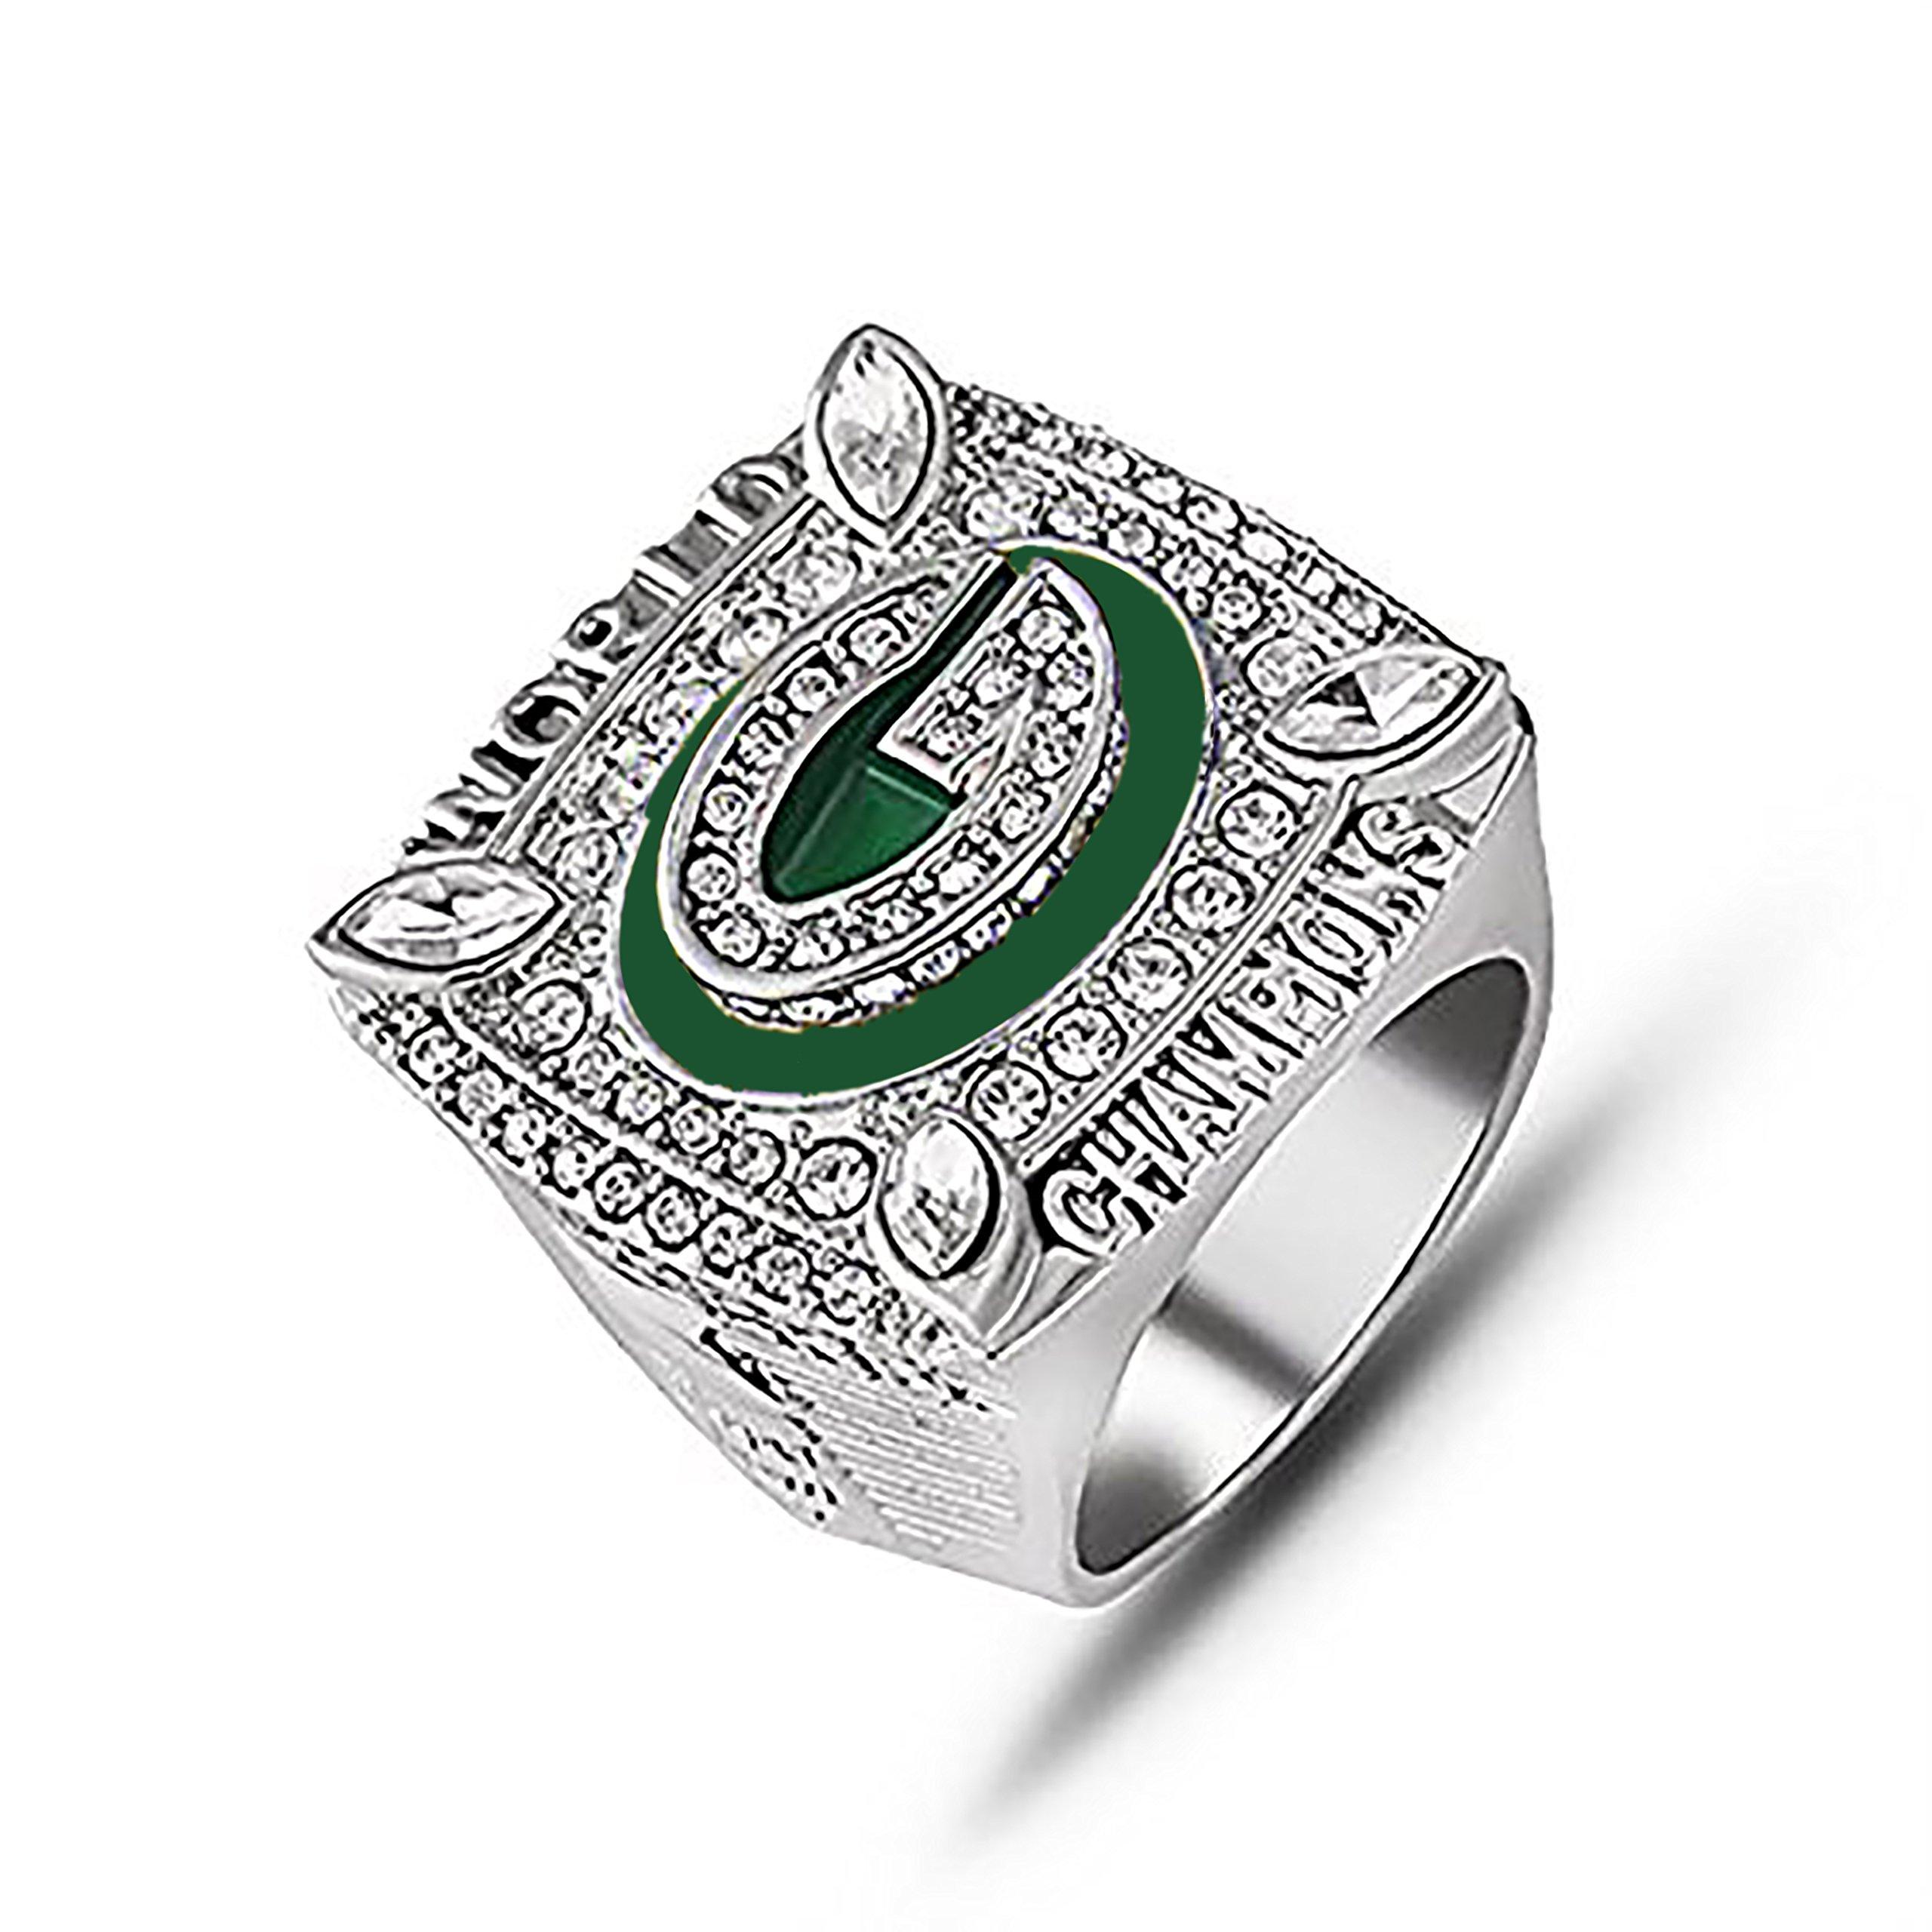 GF-sports store Replica Championship Ring 2010 Green Bay Packers Gift Fashion Ring